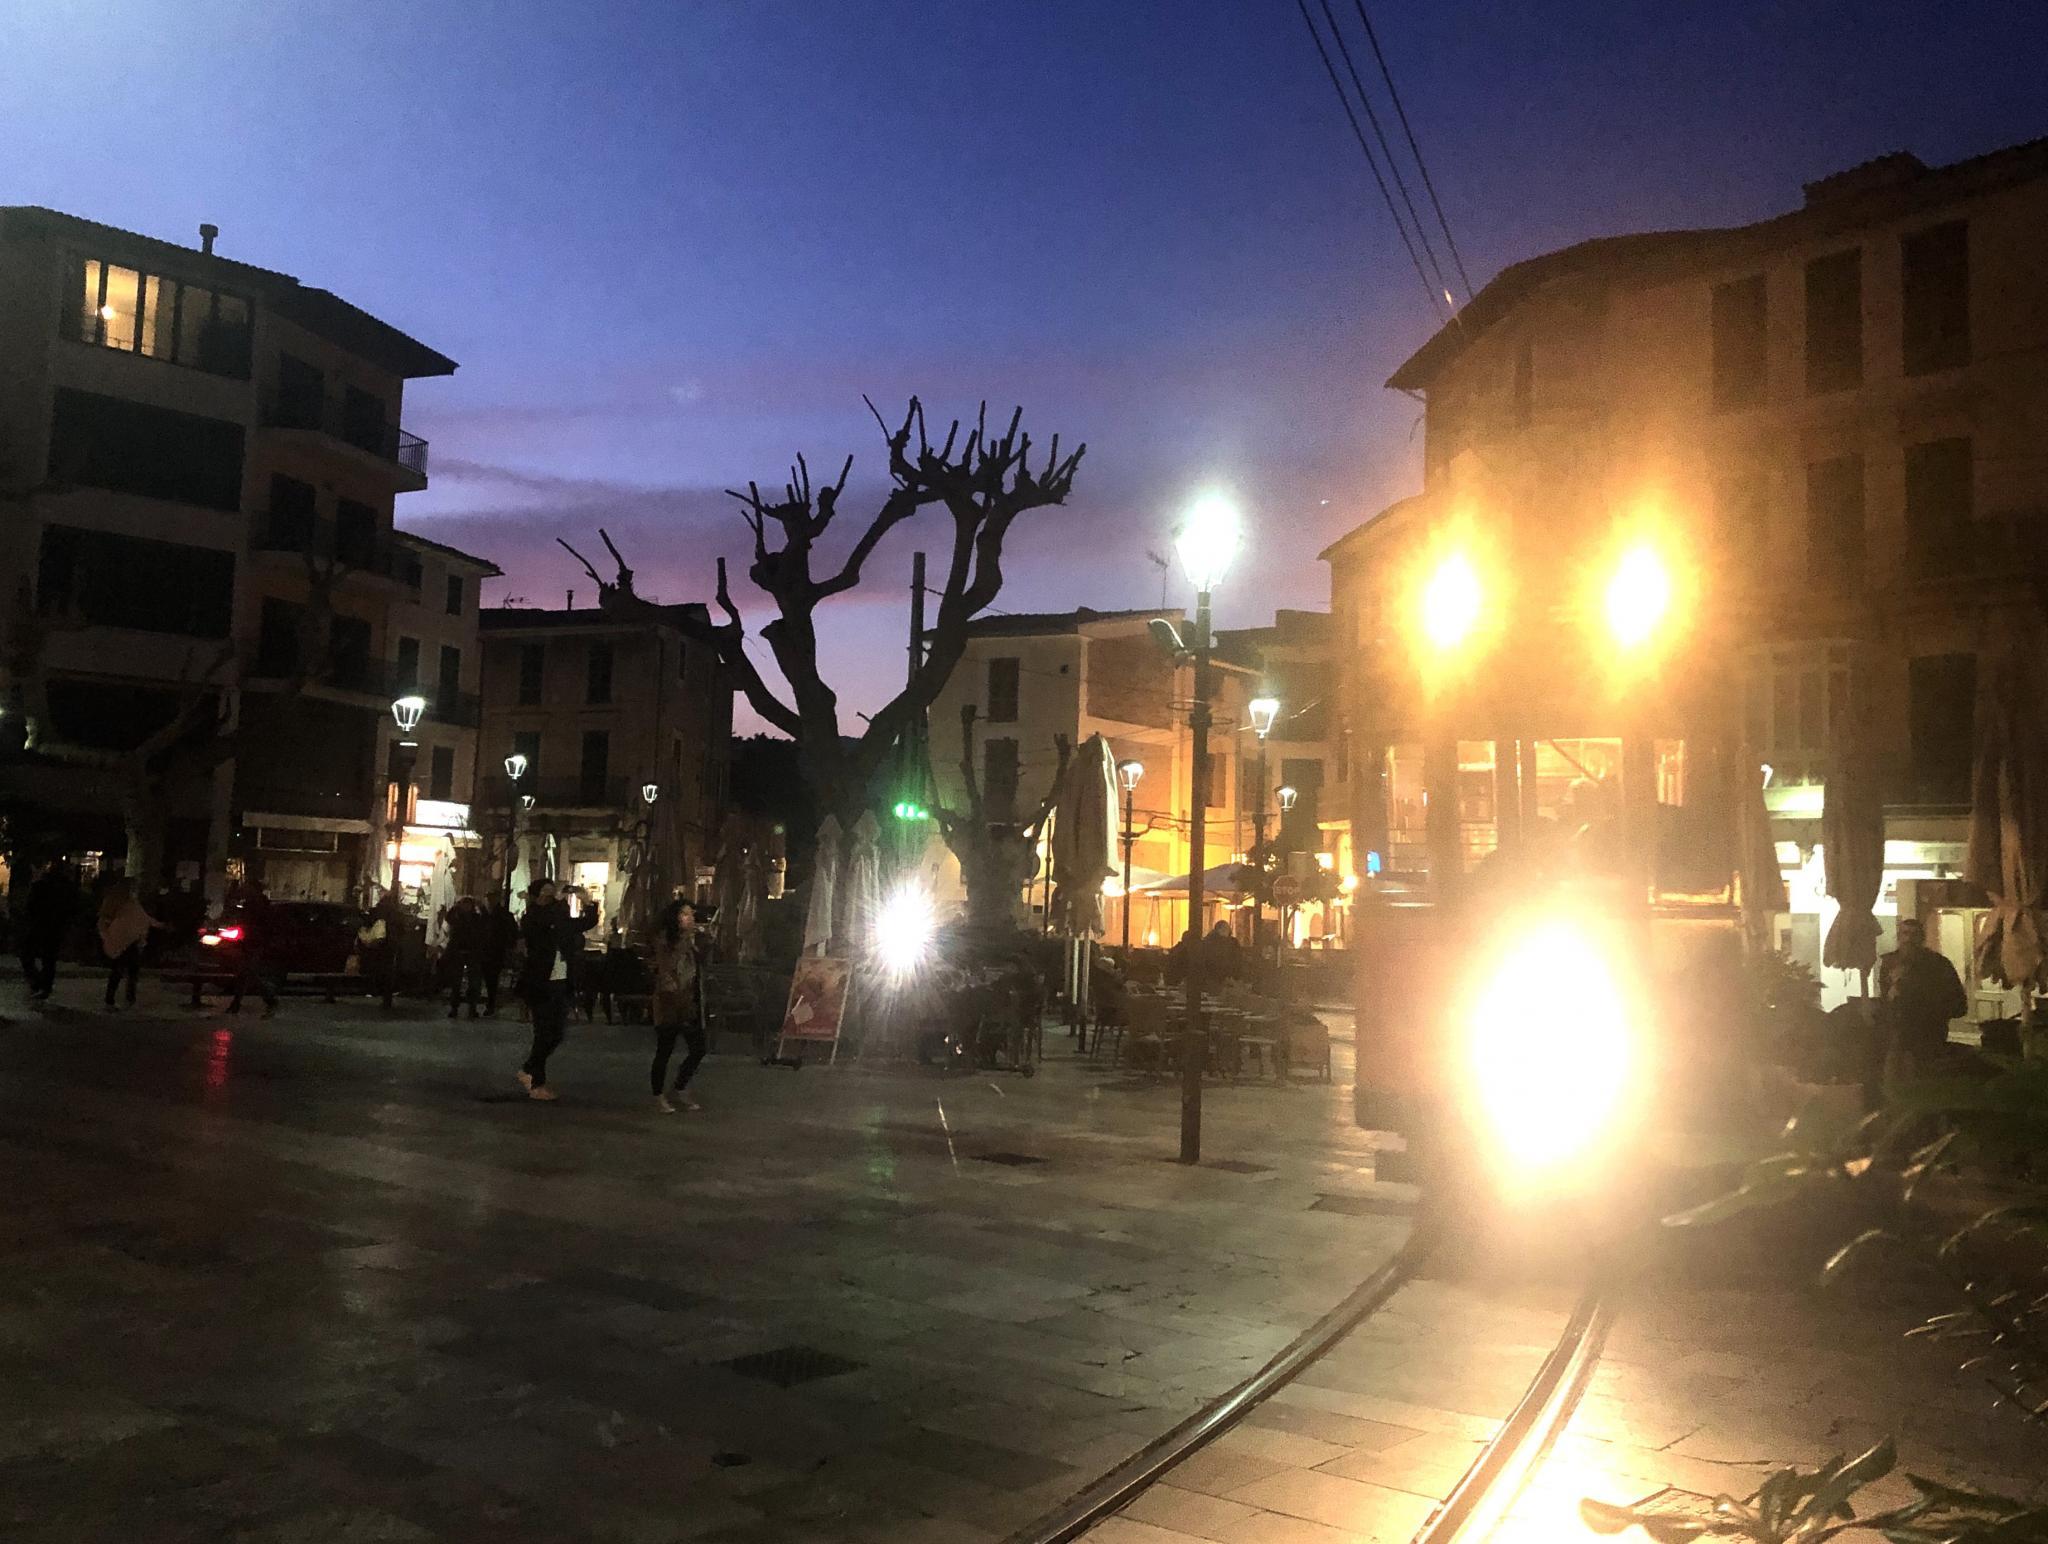 Soller tram crosses the plaza